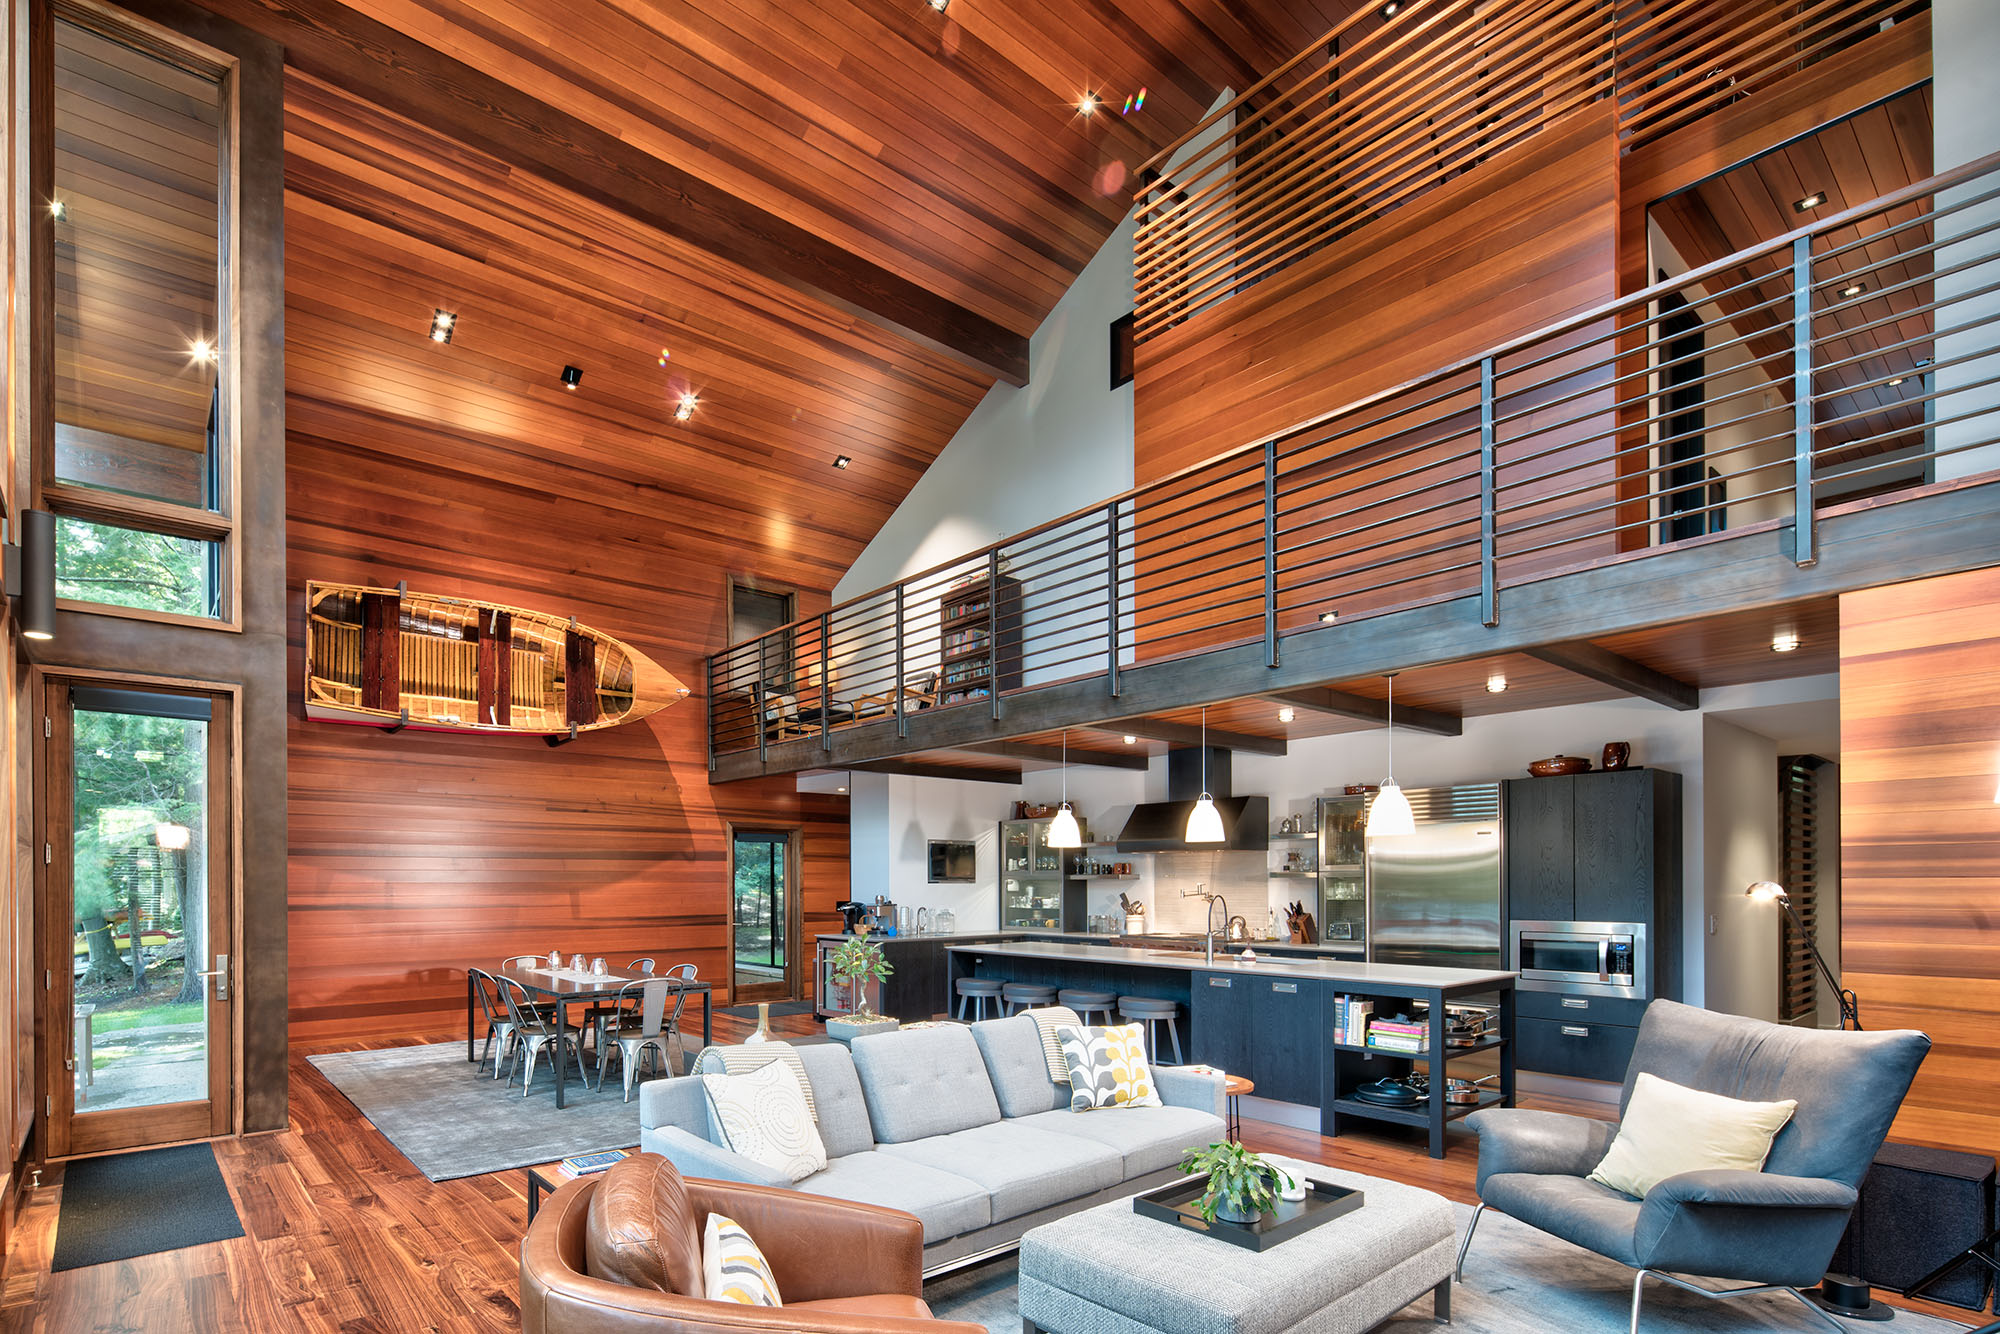 Outstanding Vacation Home Builder Design Build Northern Michigan Download Free Architecture Designs Pushbritishbridgeorg